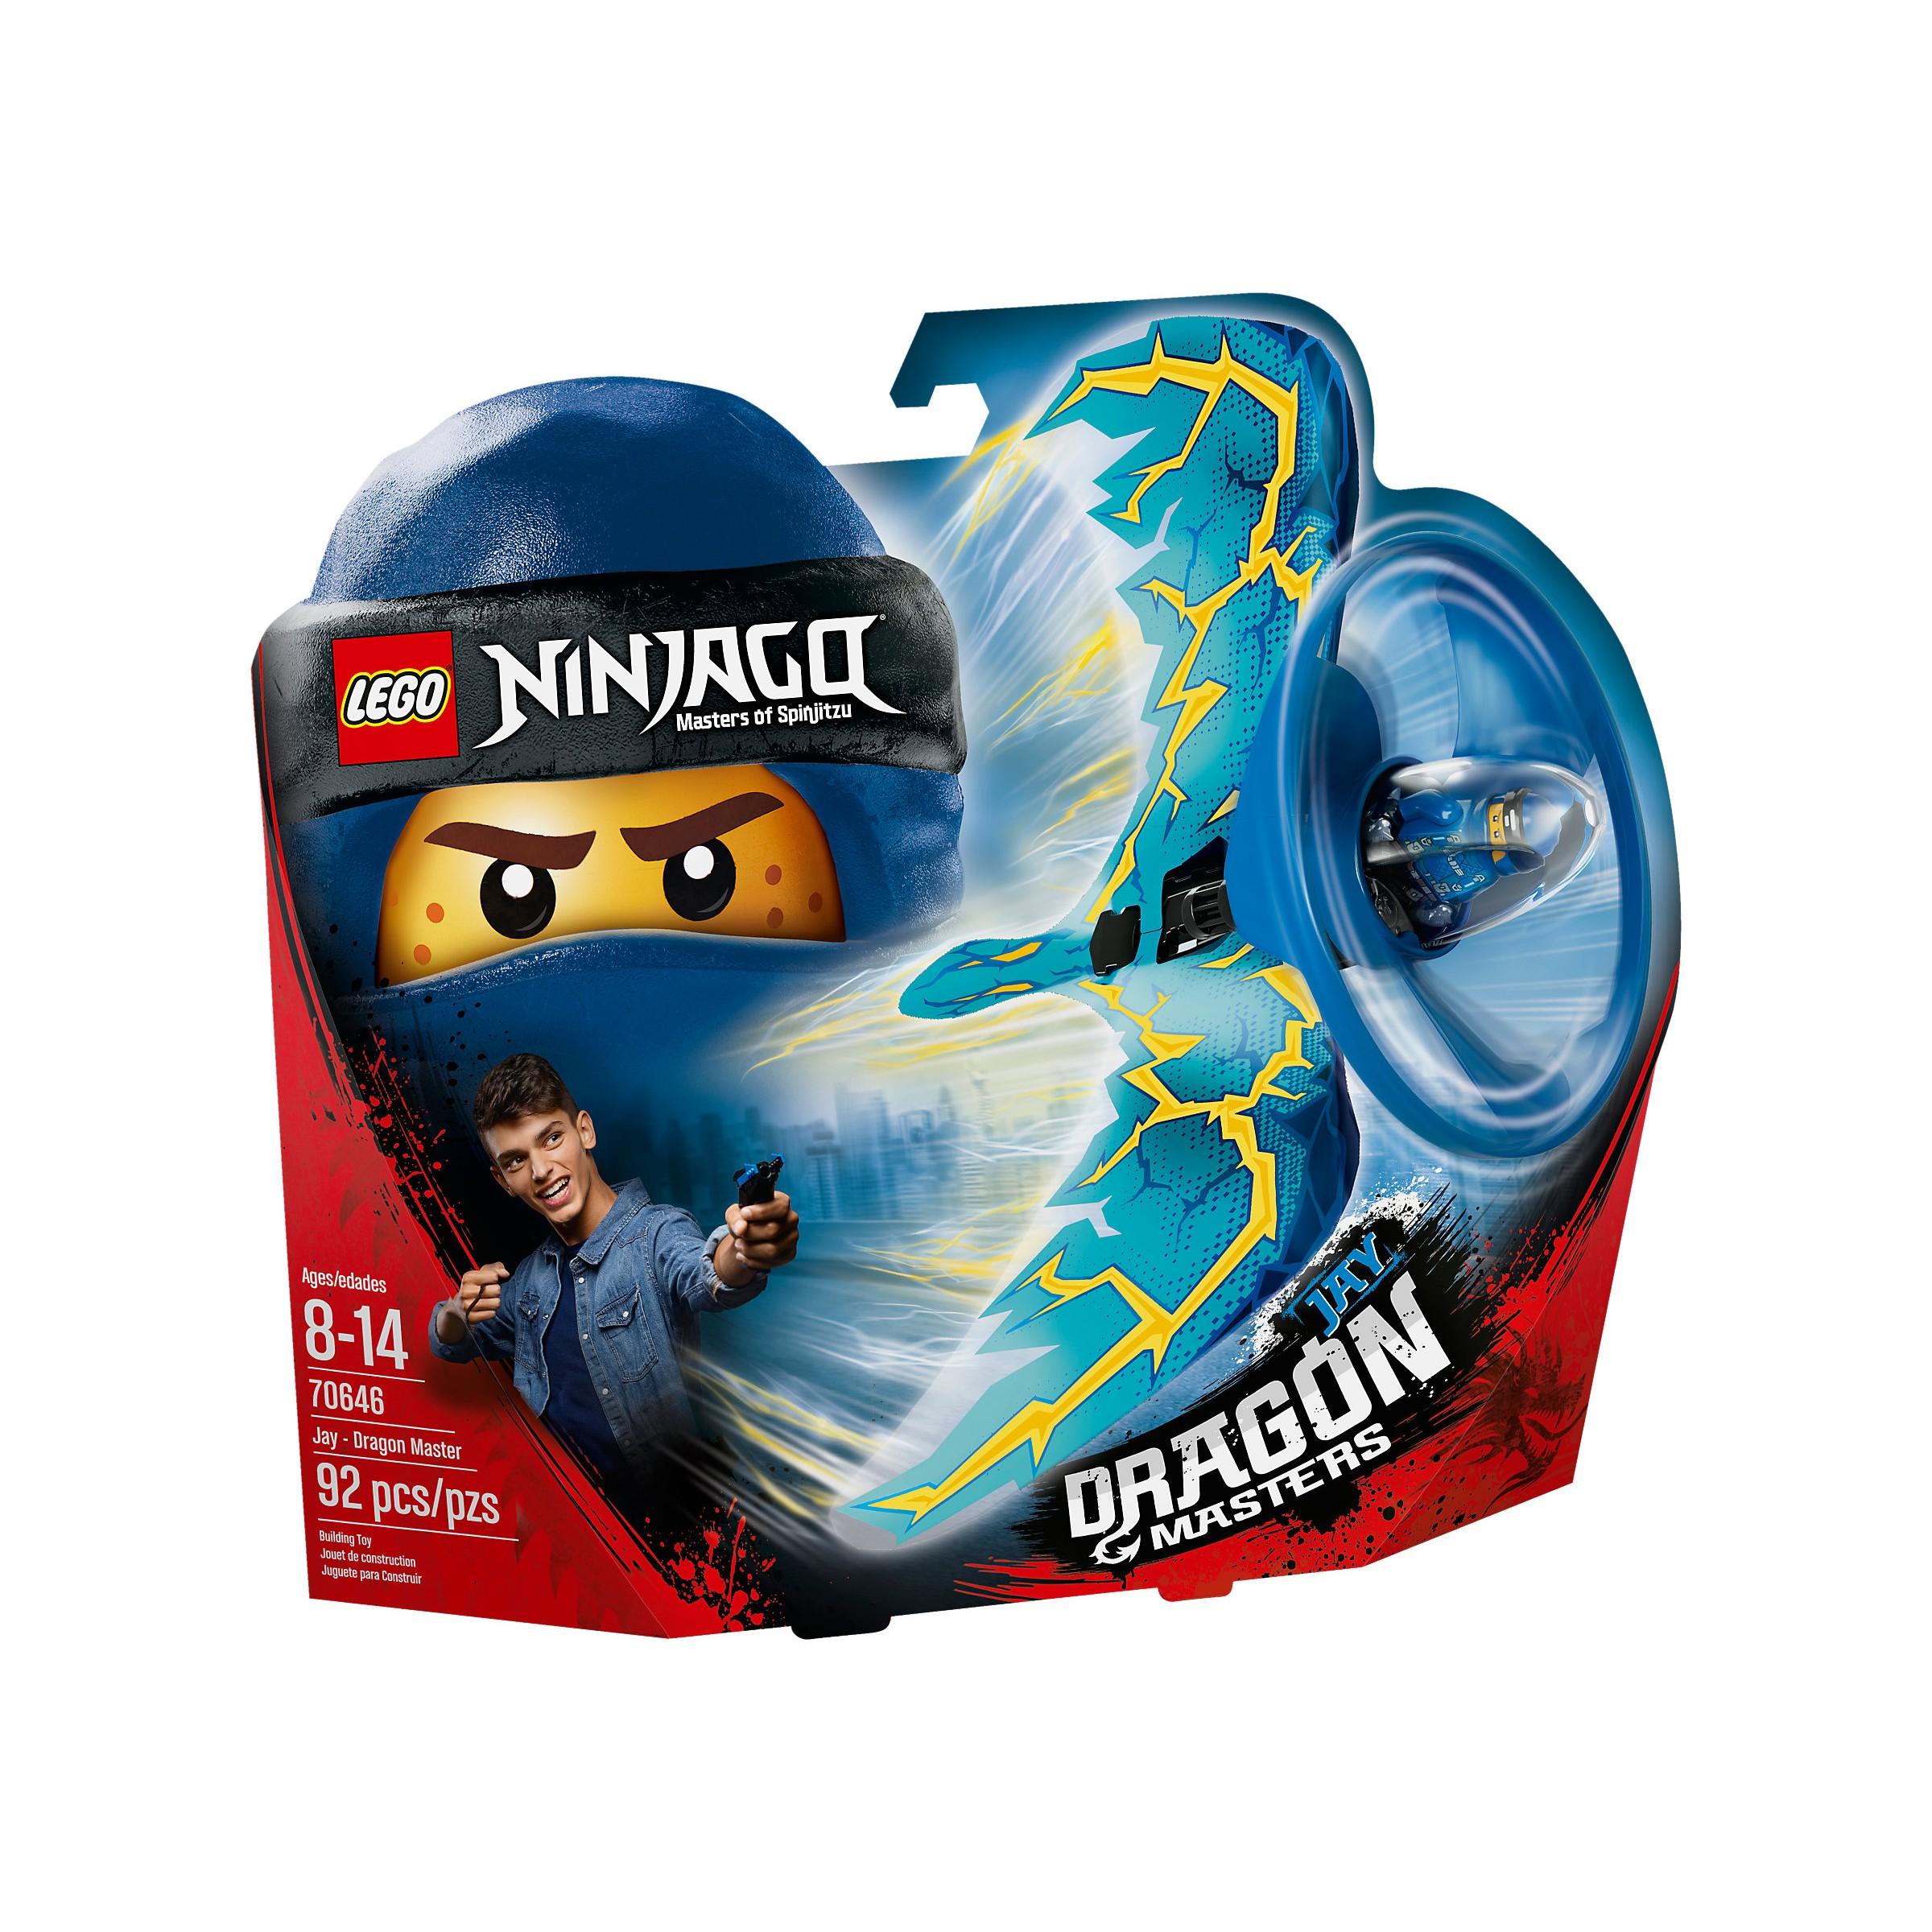 lego 70646 ninjago jay  dragon master at hobby warehouse